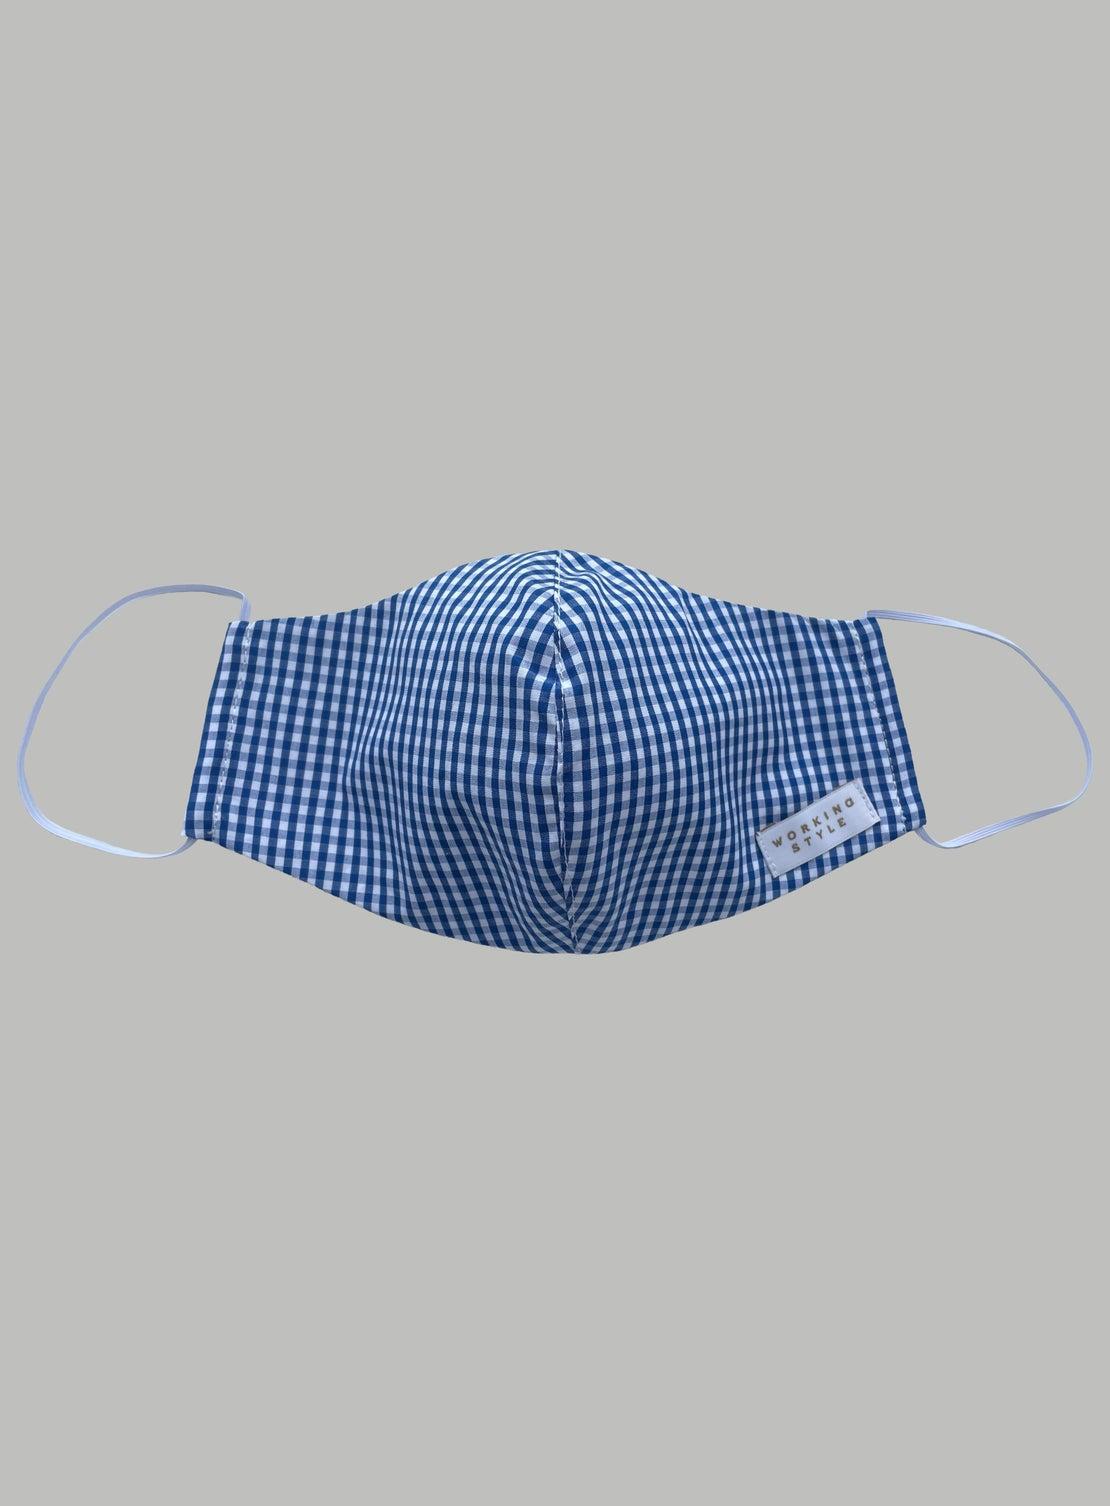 Face Mask - Blue Gingham Cotton